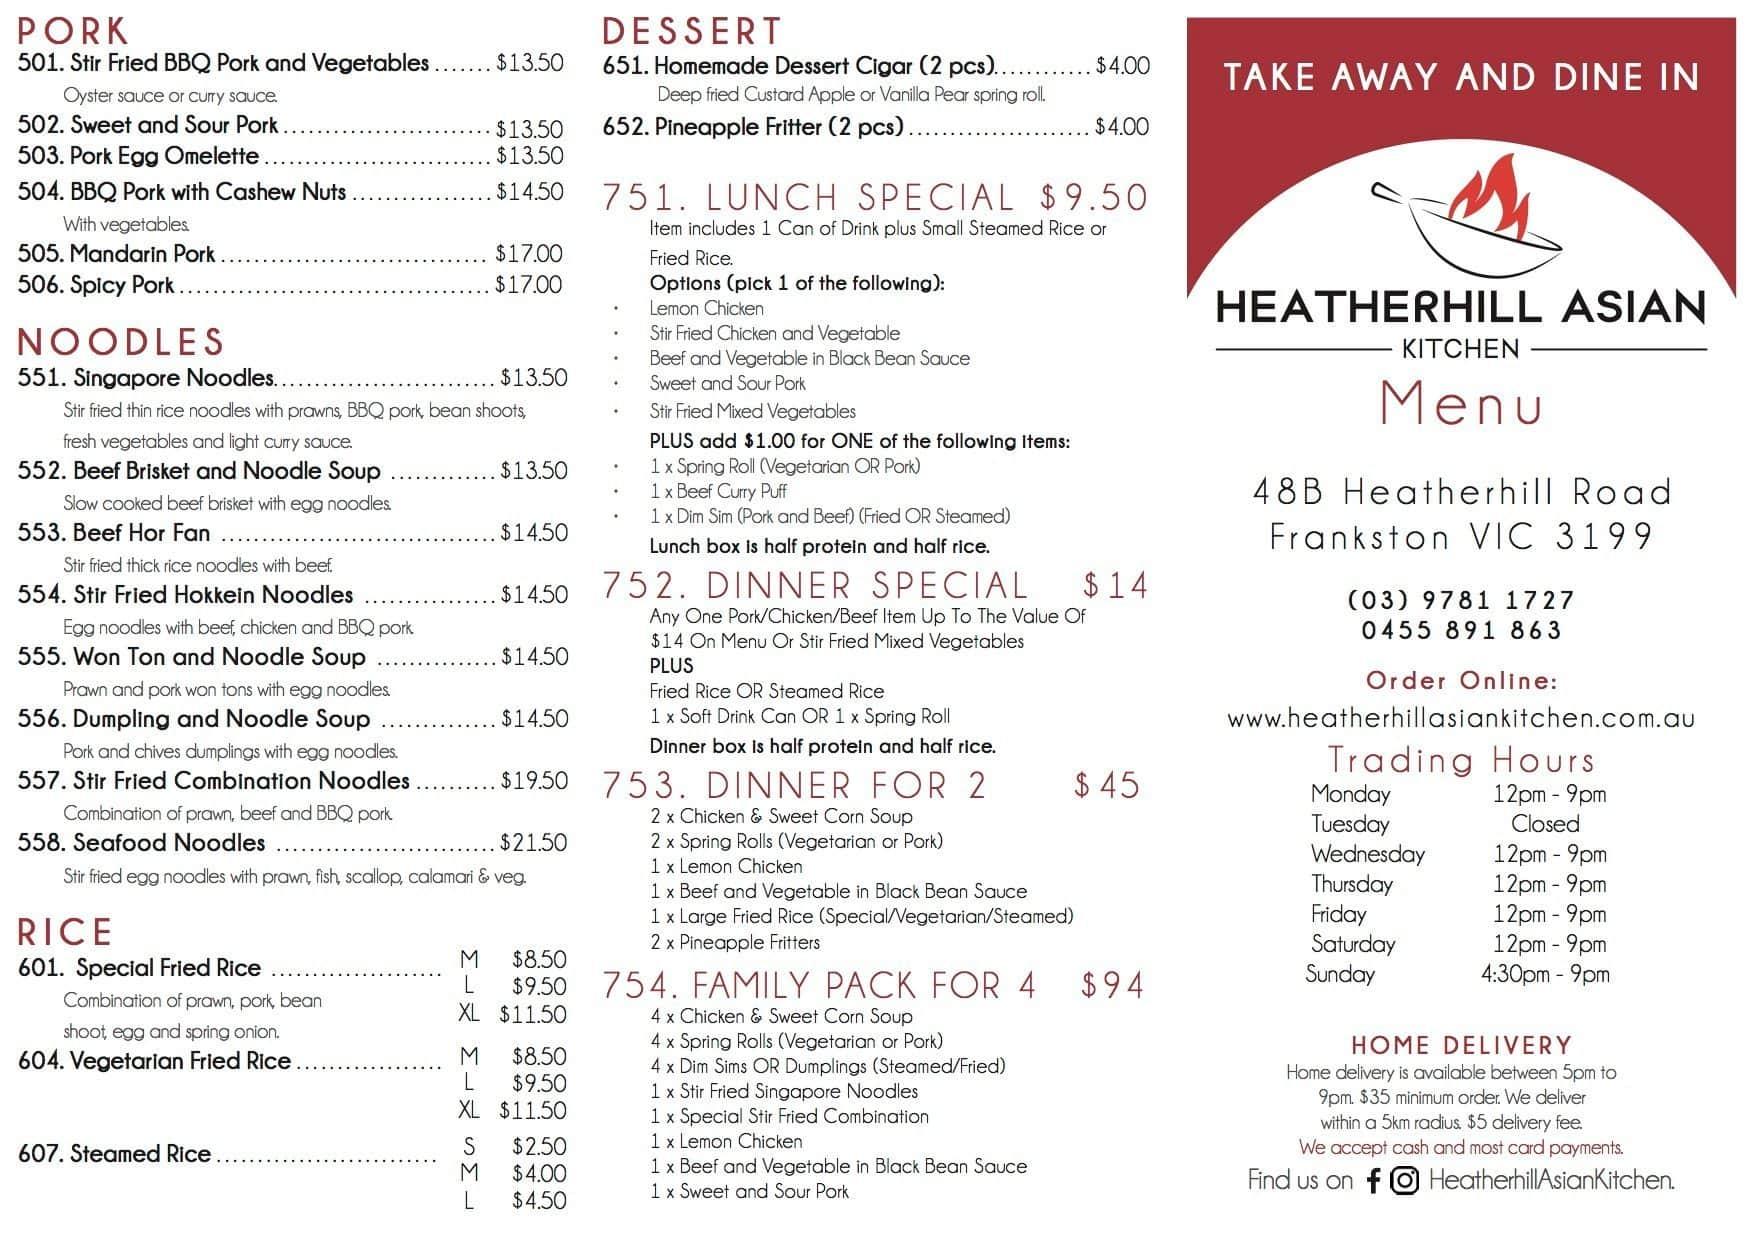 Heatherhill asian kitchen frankston menu